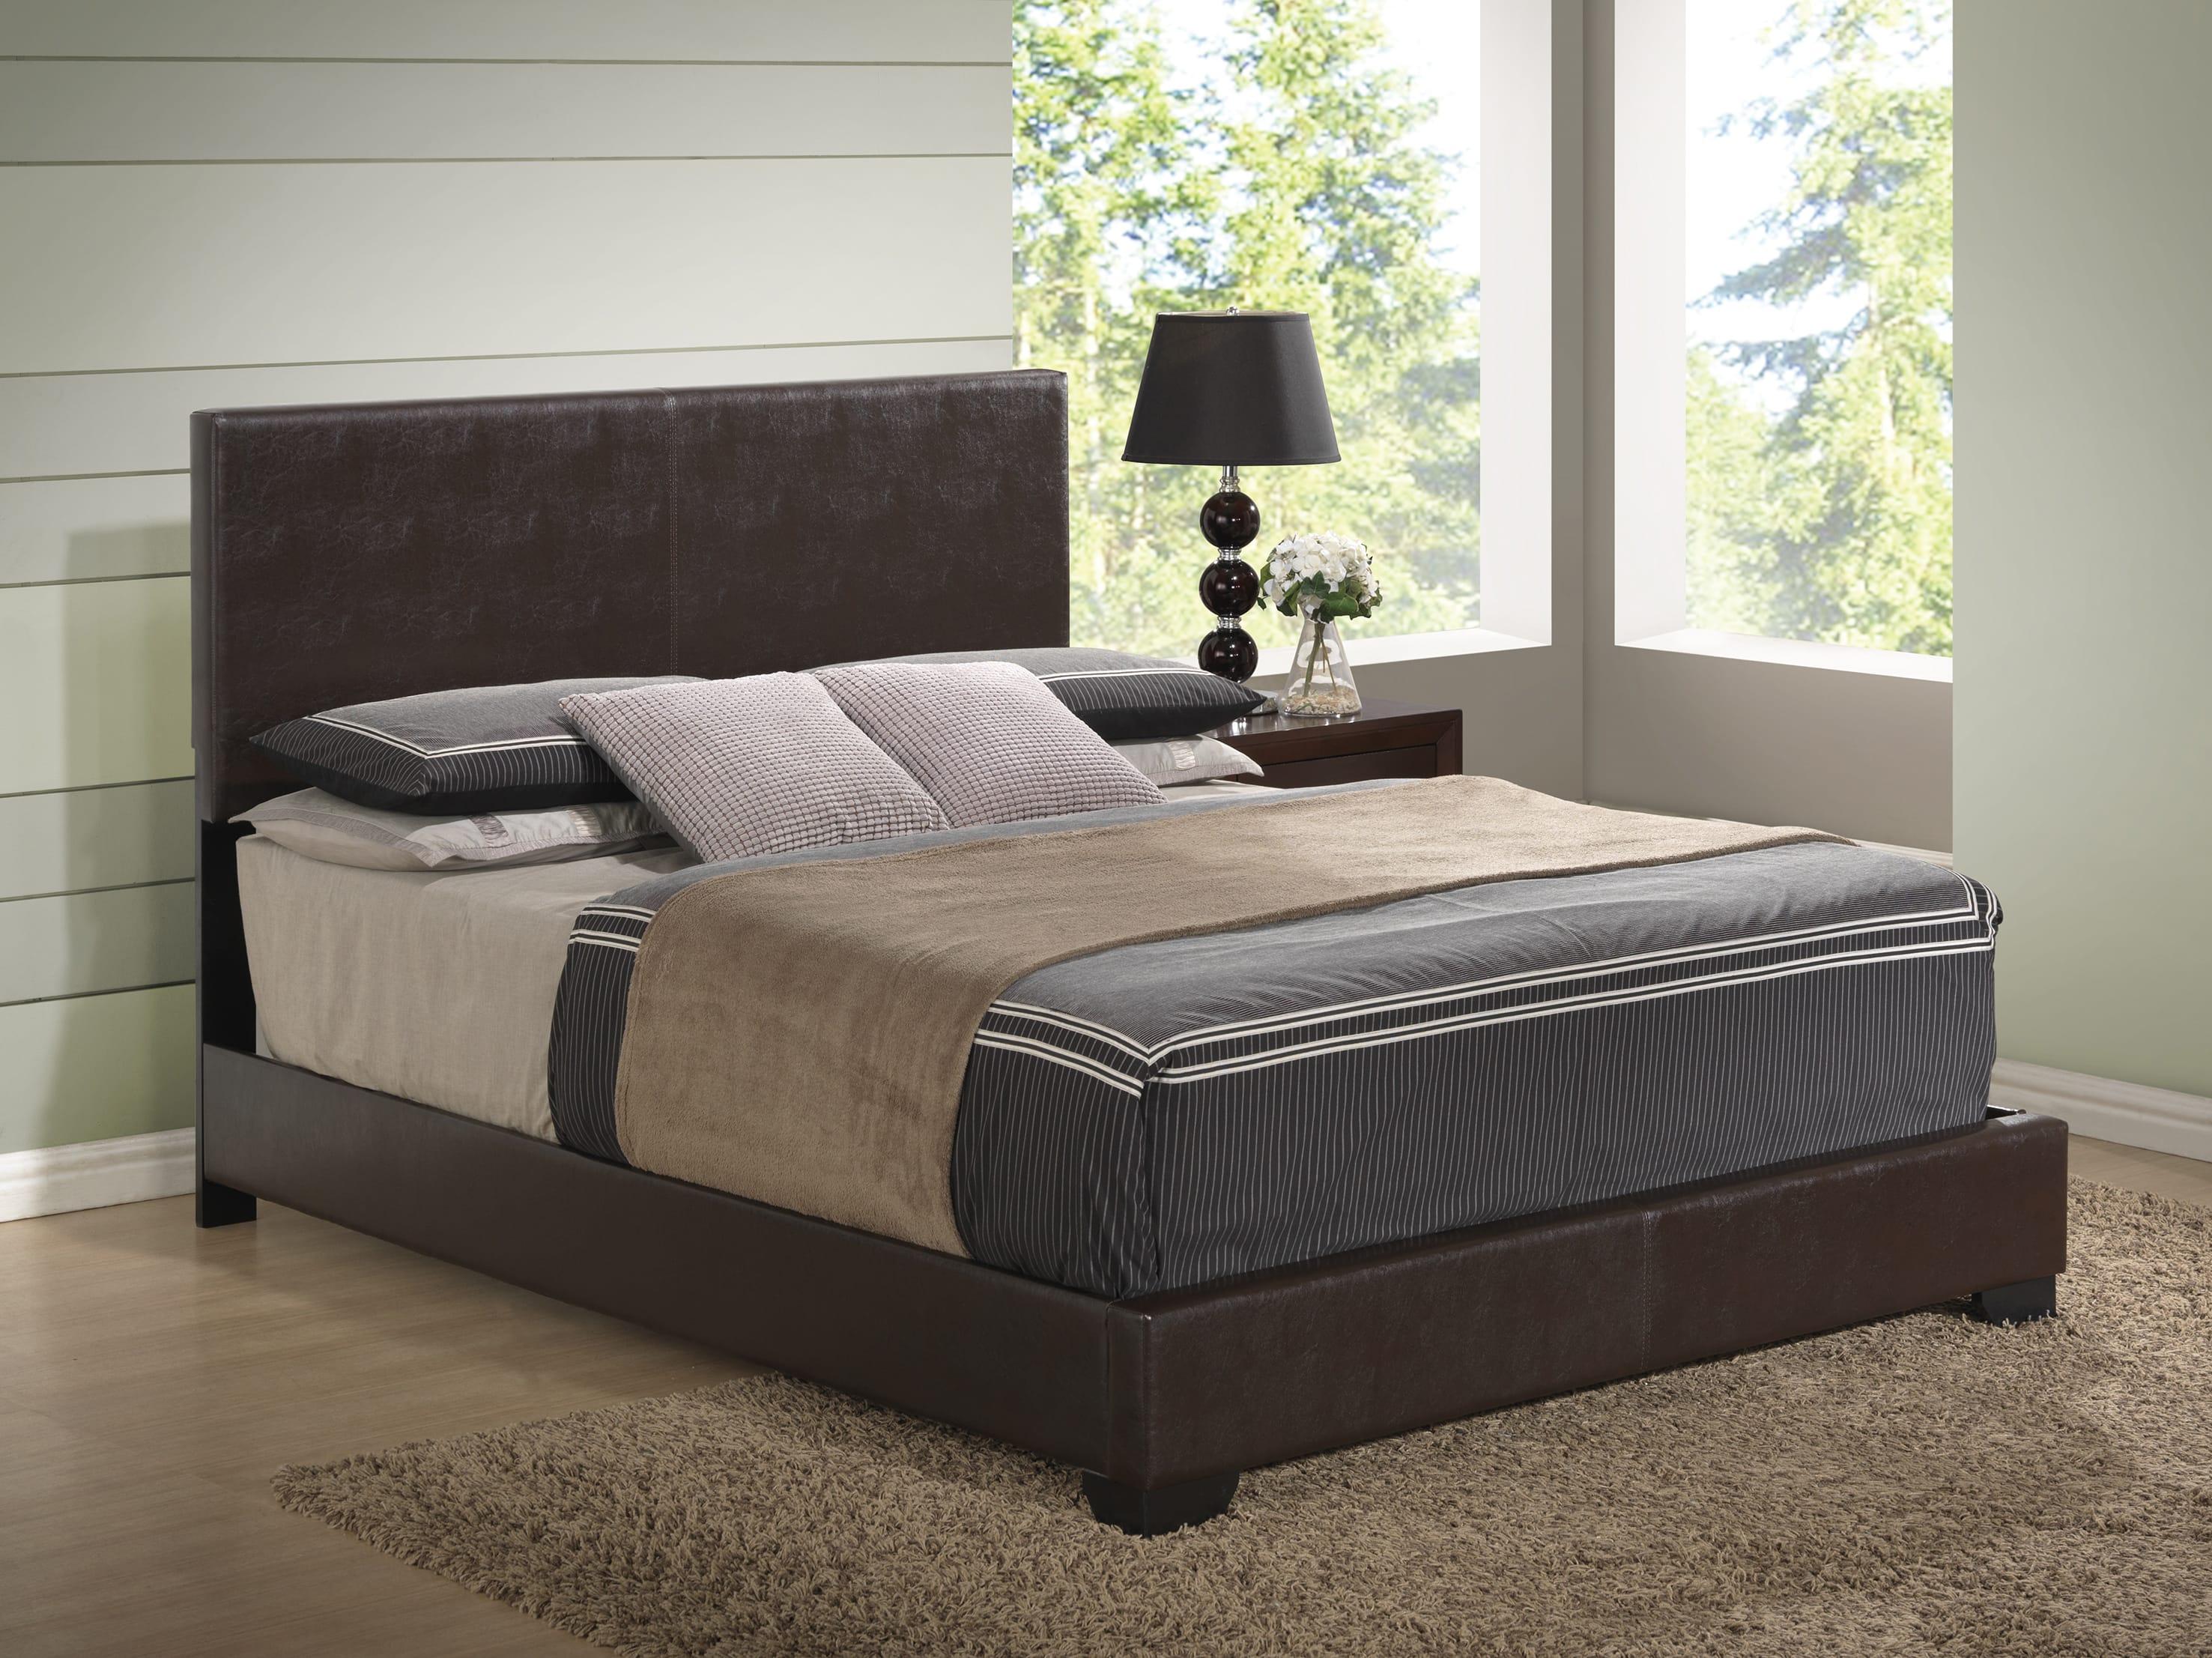 Rosa Antique Black Bedroom Set (w/8103 Brown PU Bed) by Global Furniture